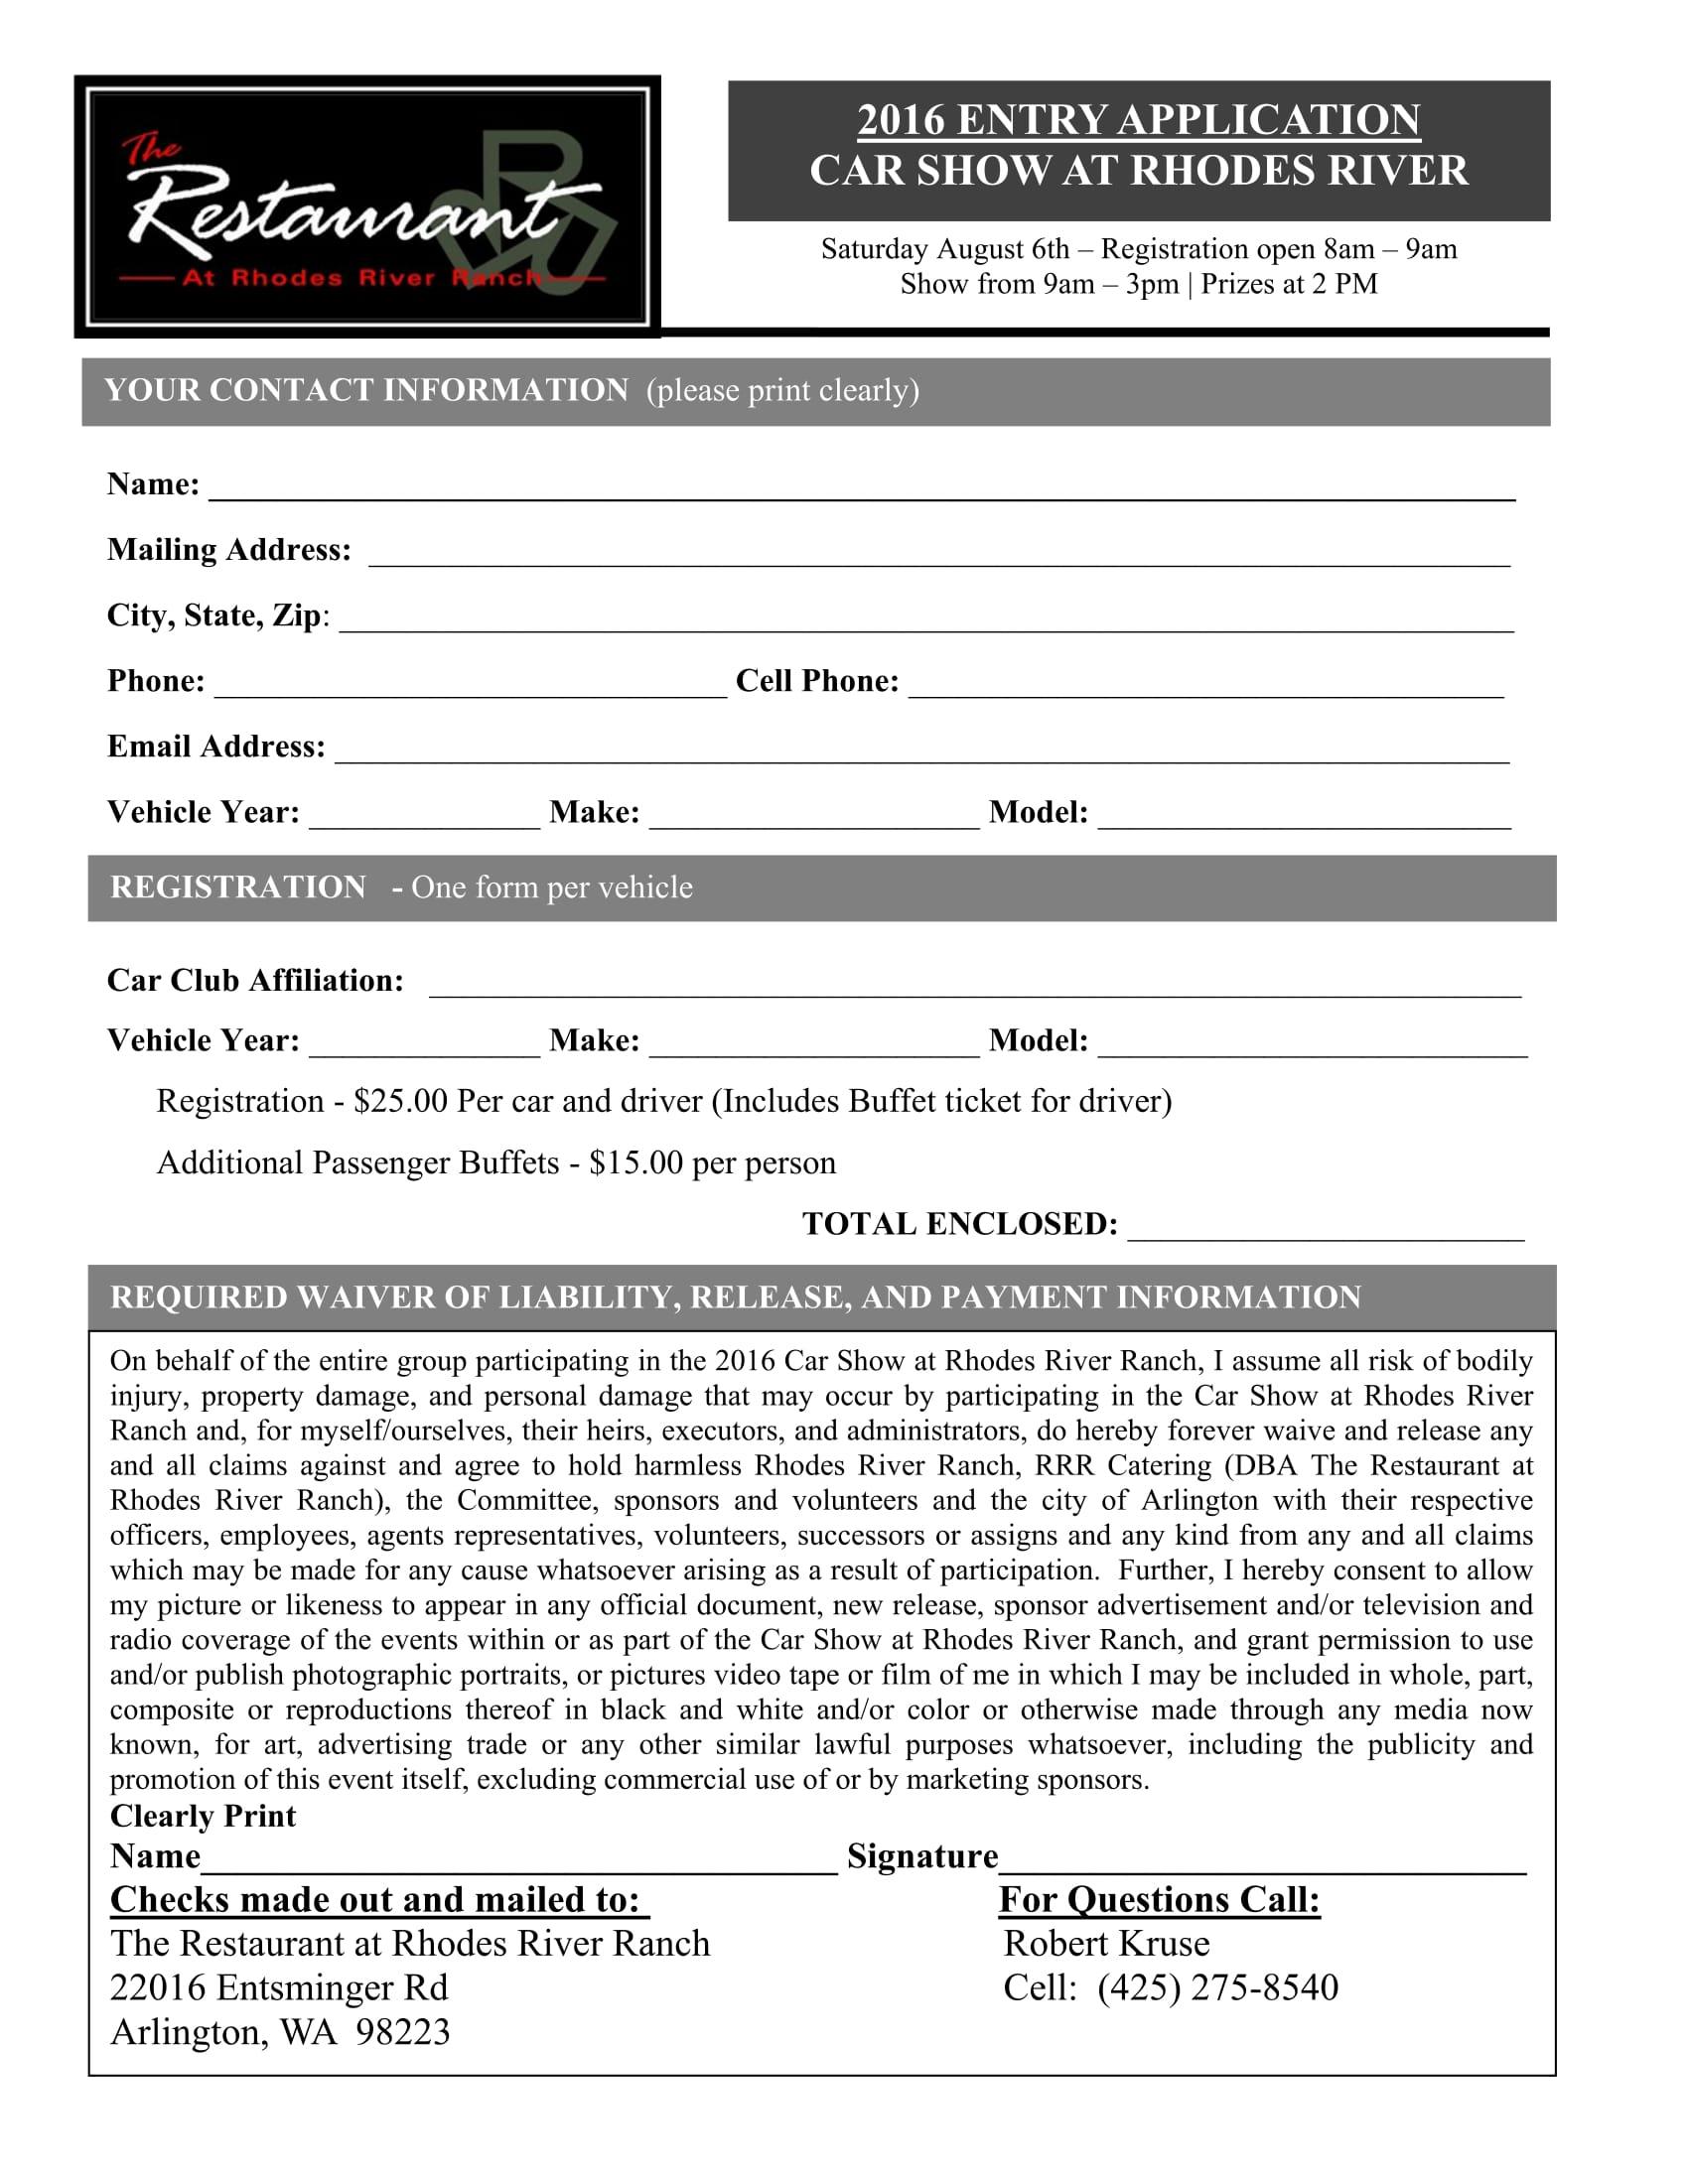 car show application registration form 1